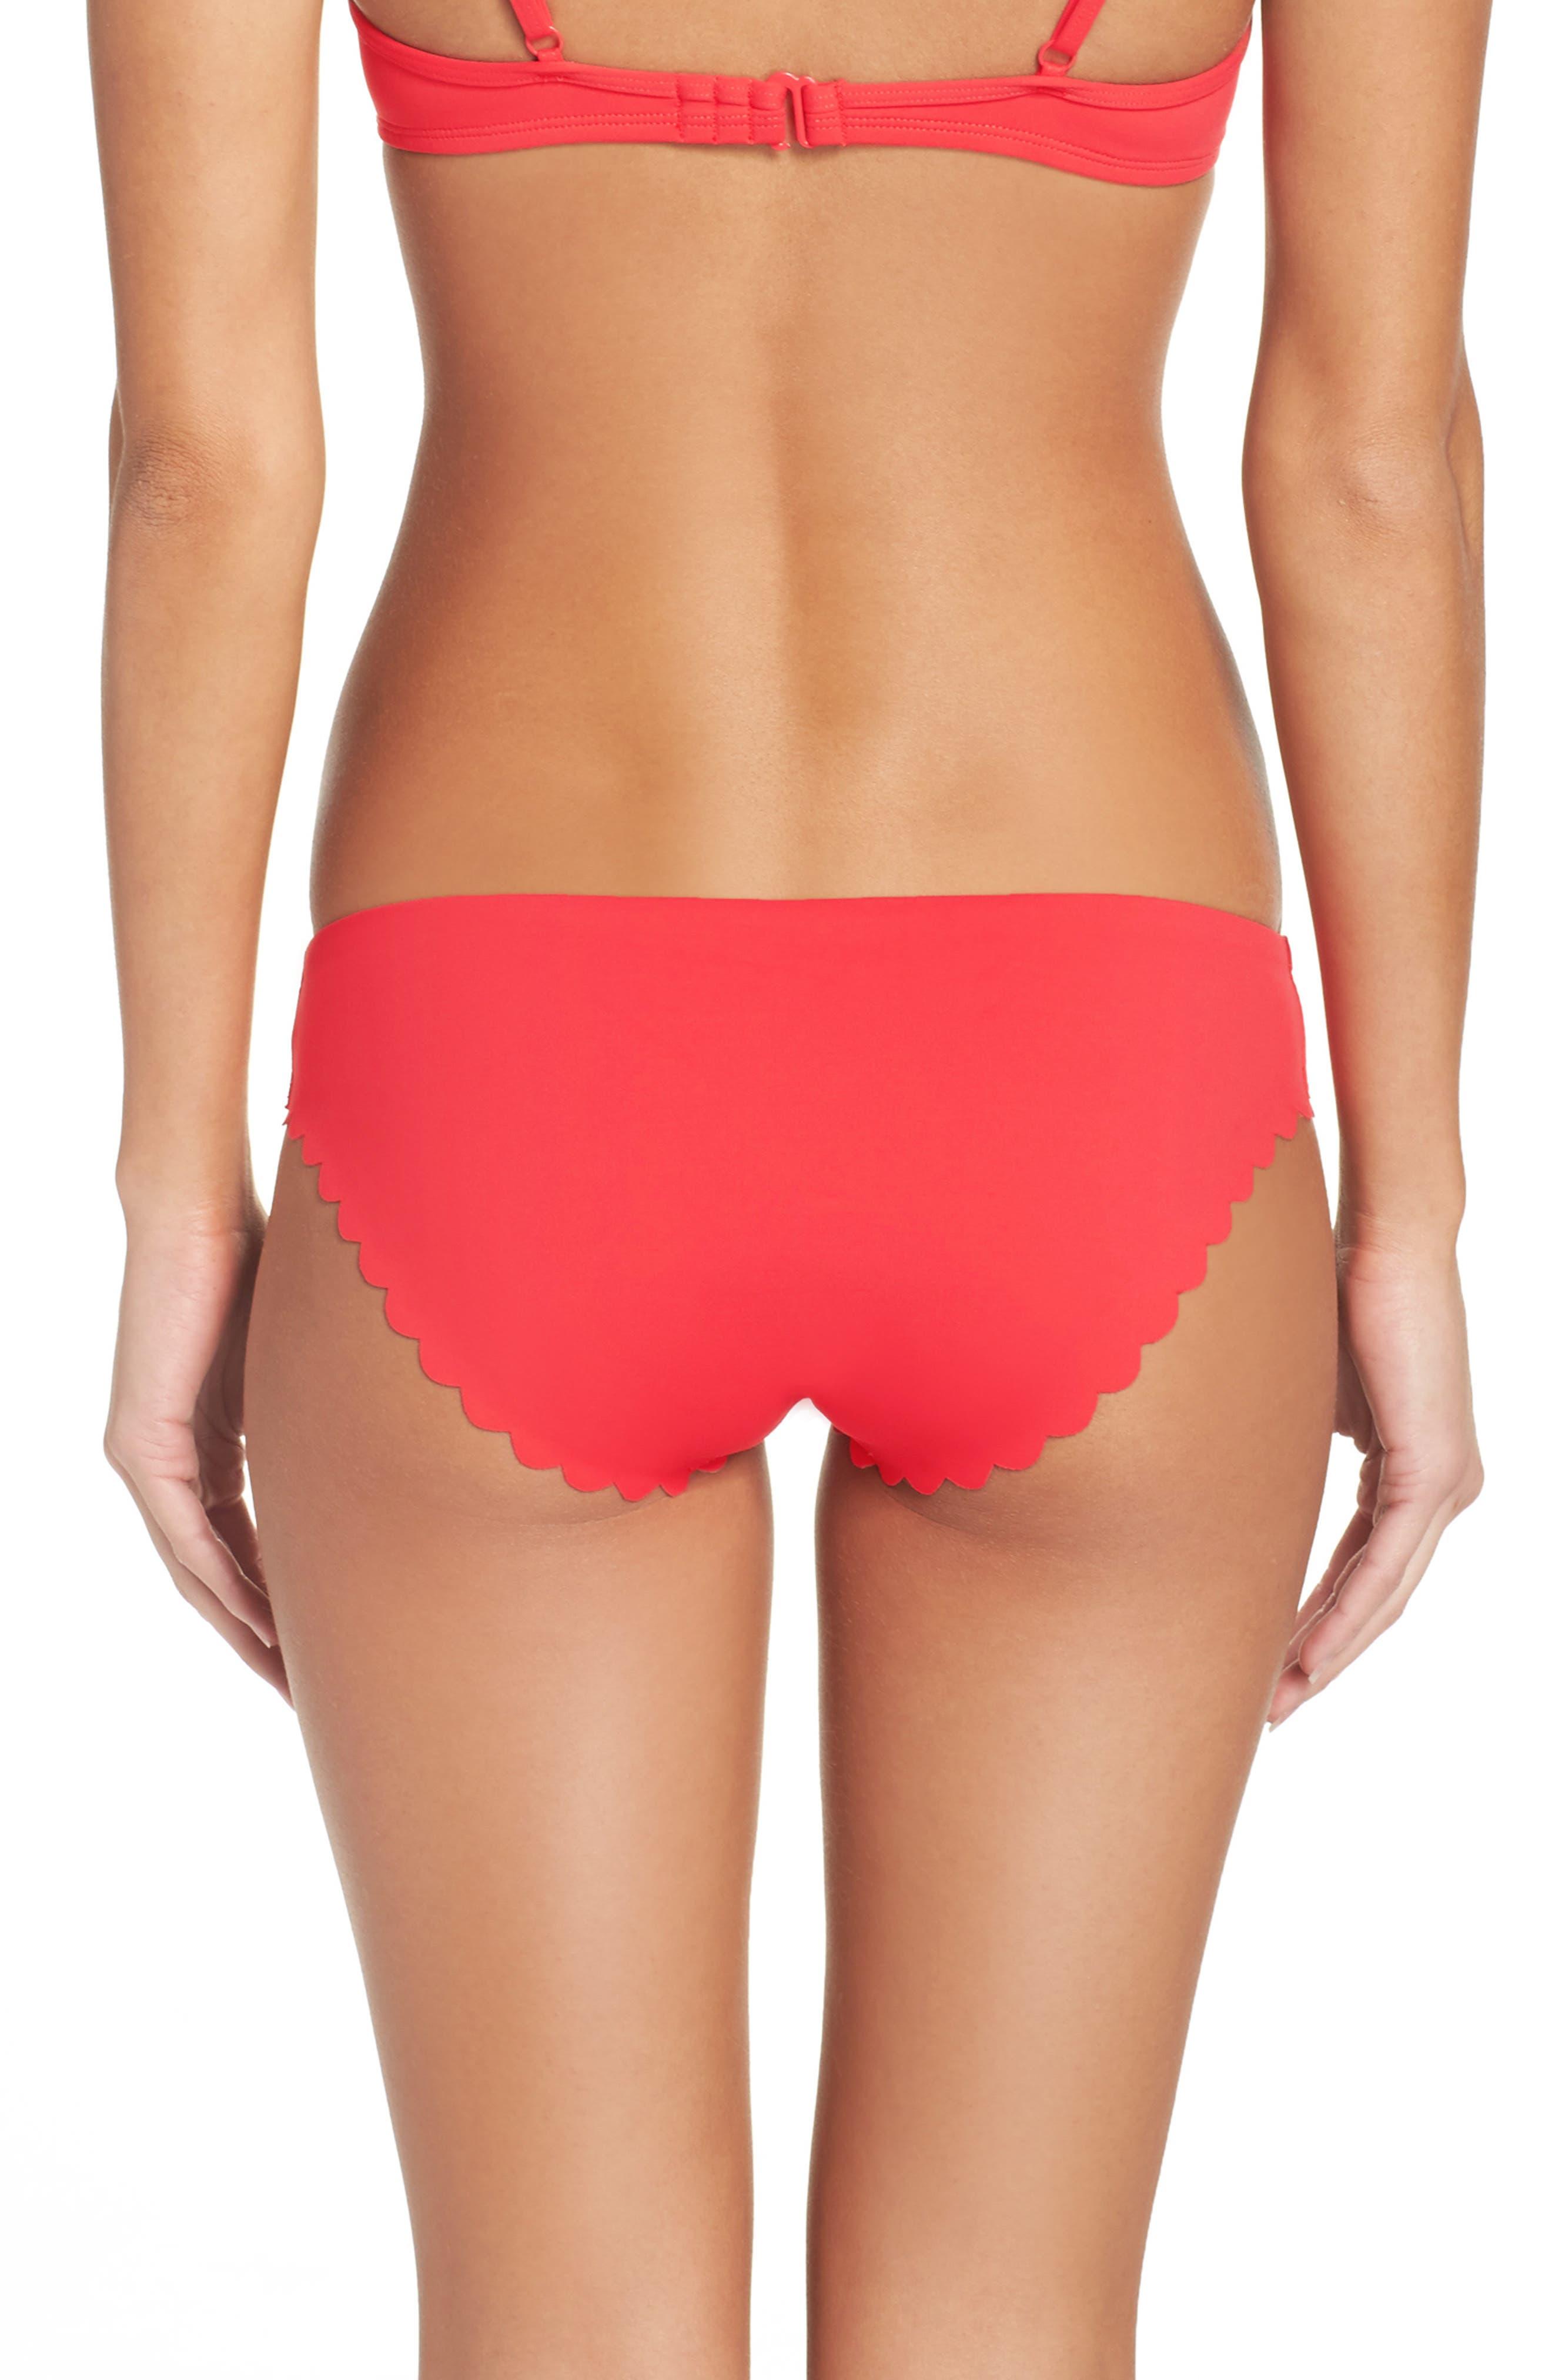 Alternate Image 2  - J.Crew Scalloped Matte Bikini Bottoms